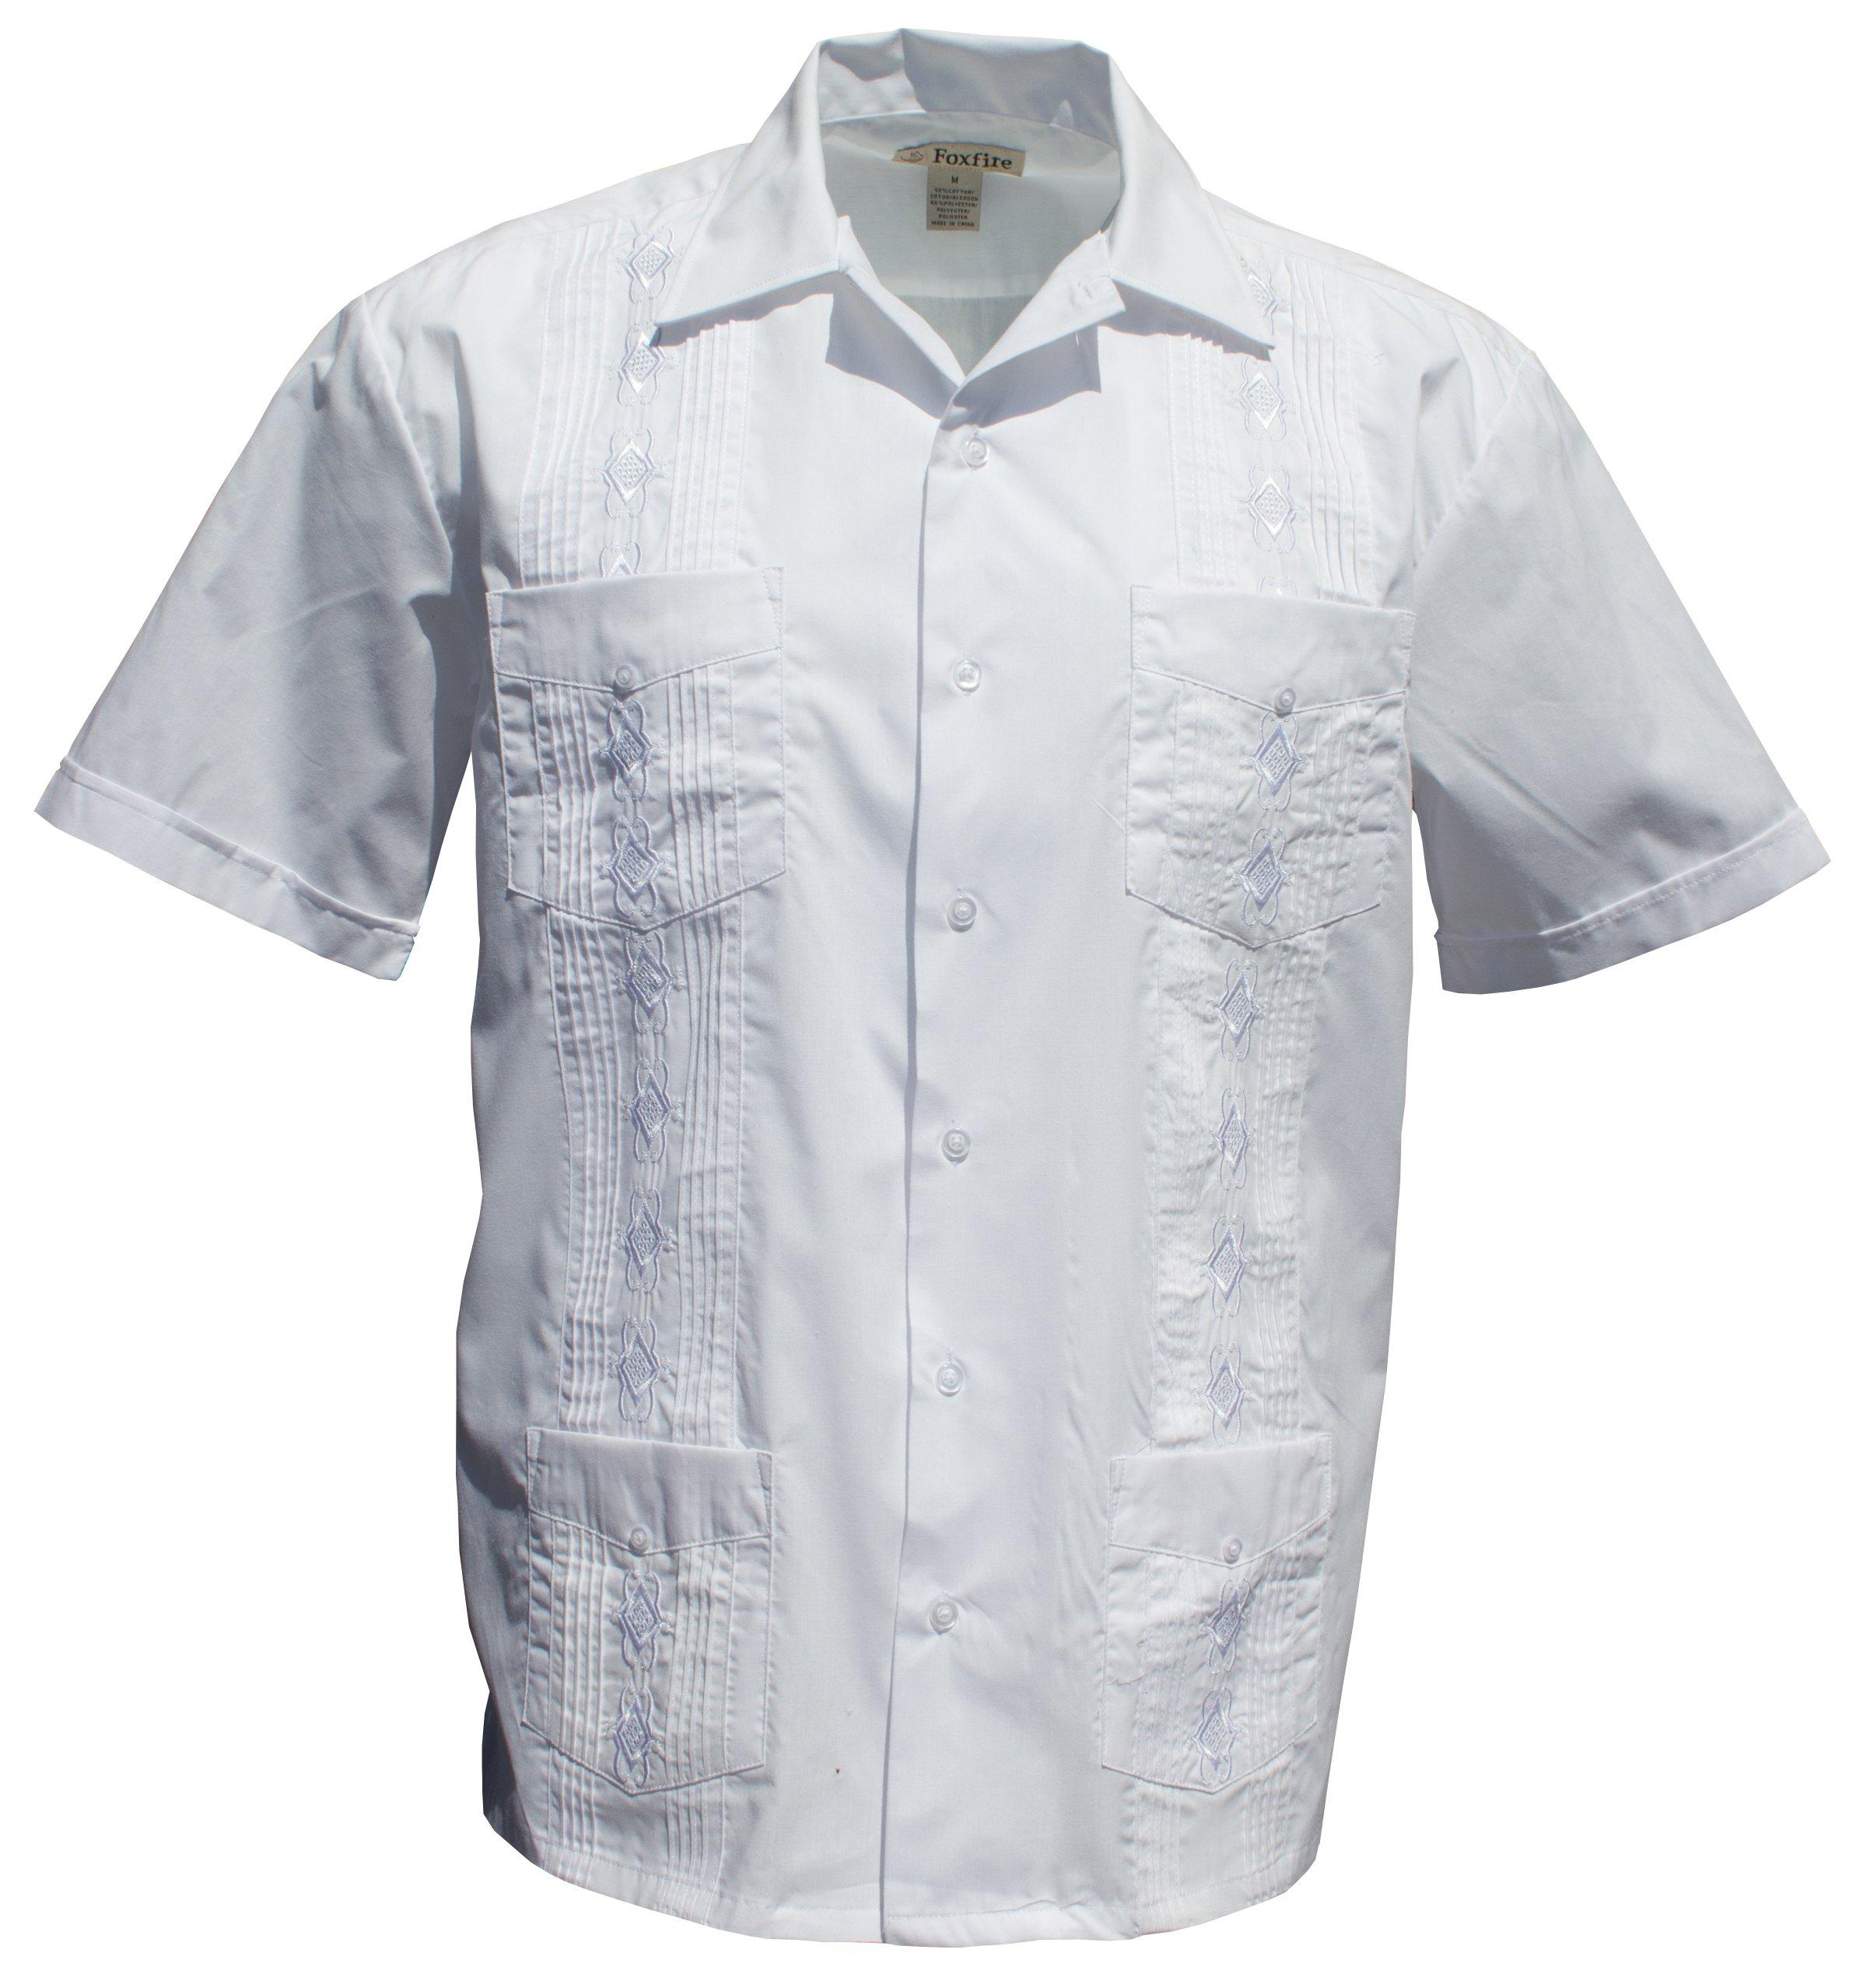 Foxfire Sportswear Men's White Guayabera Shirt Size 2X-Tall